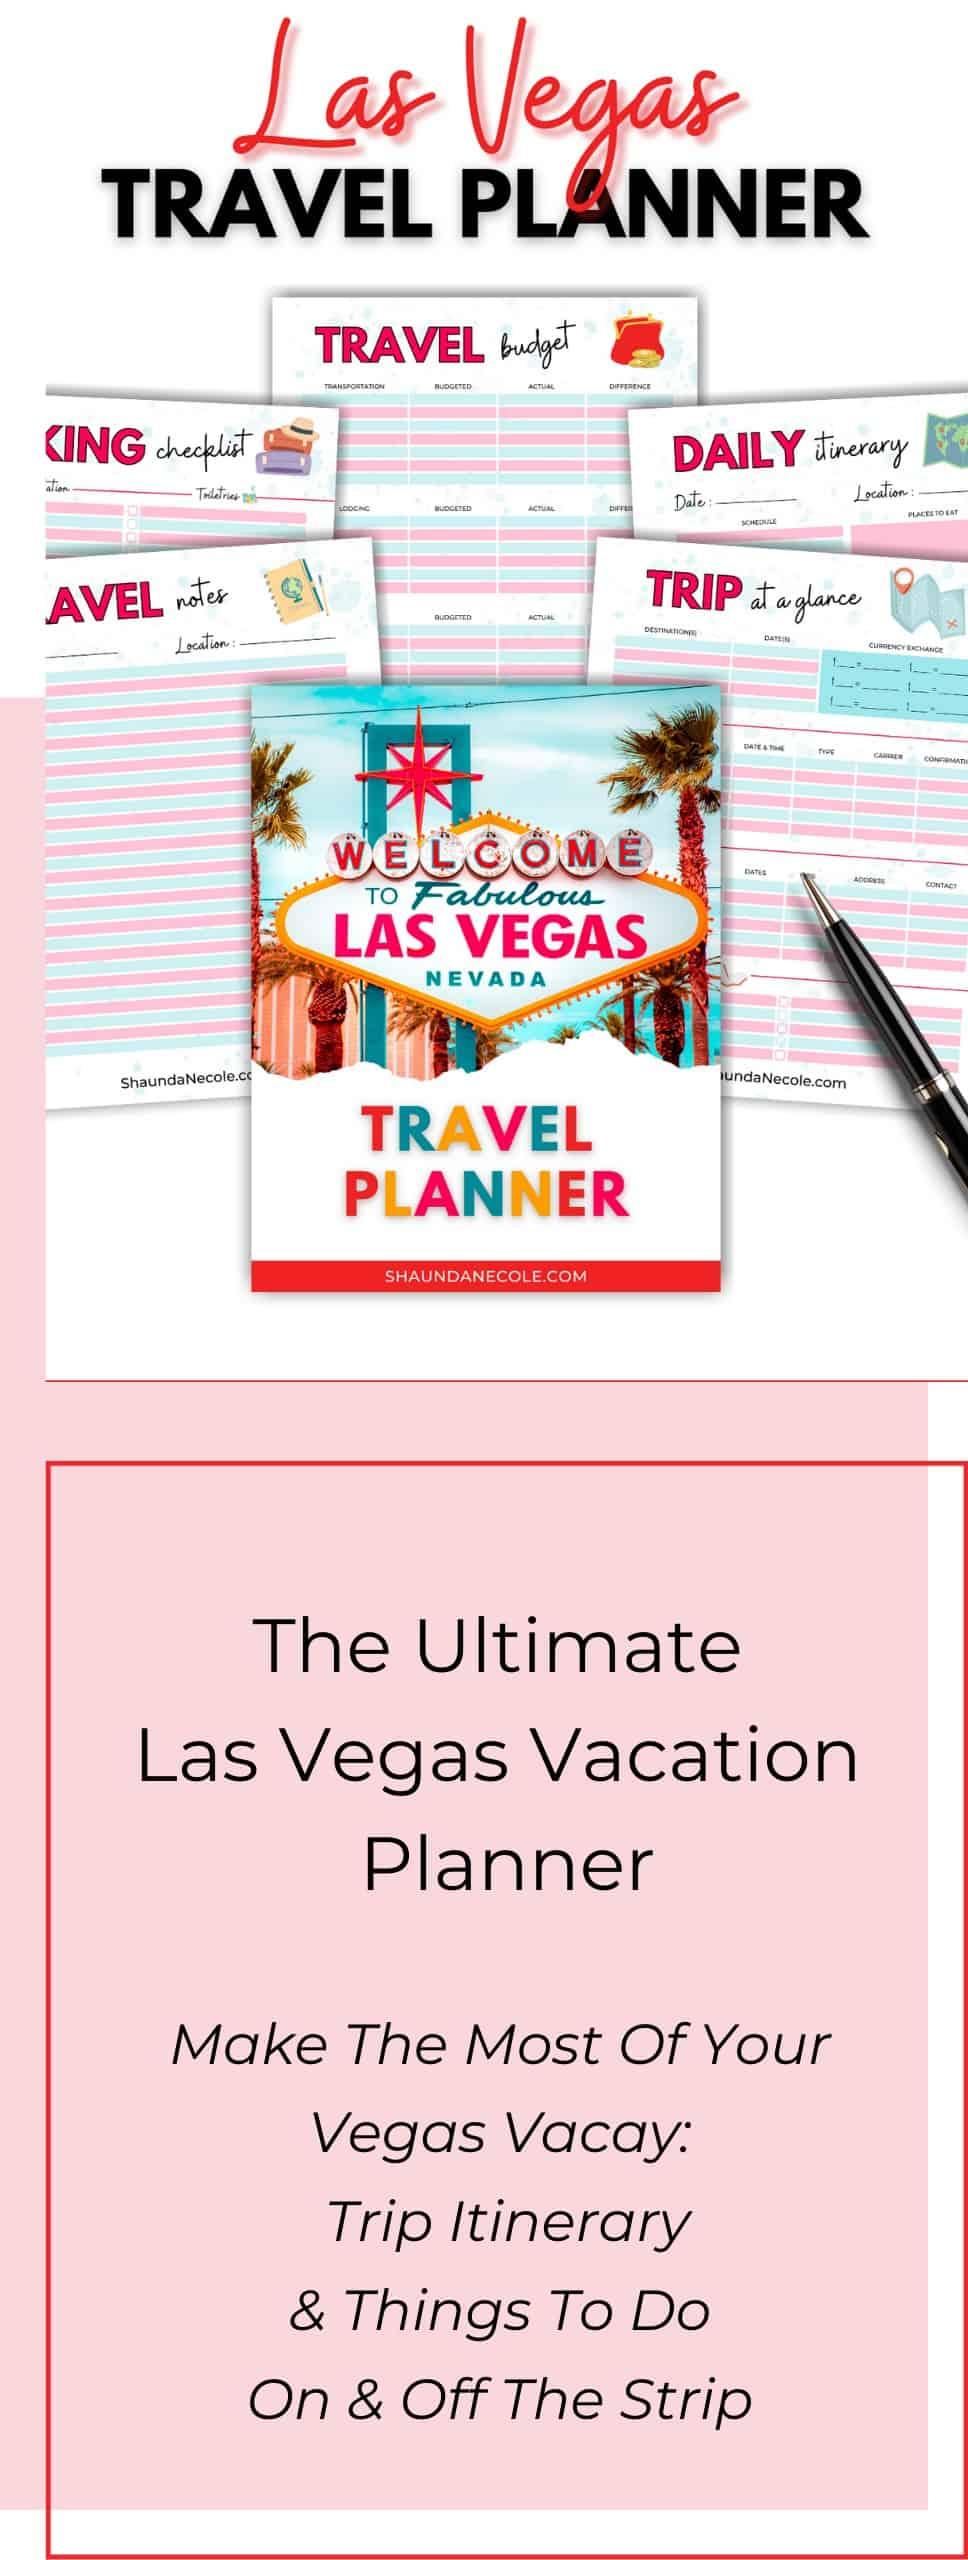 Las Vegas Travel Planner